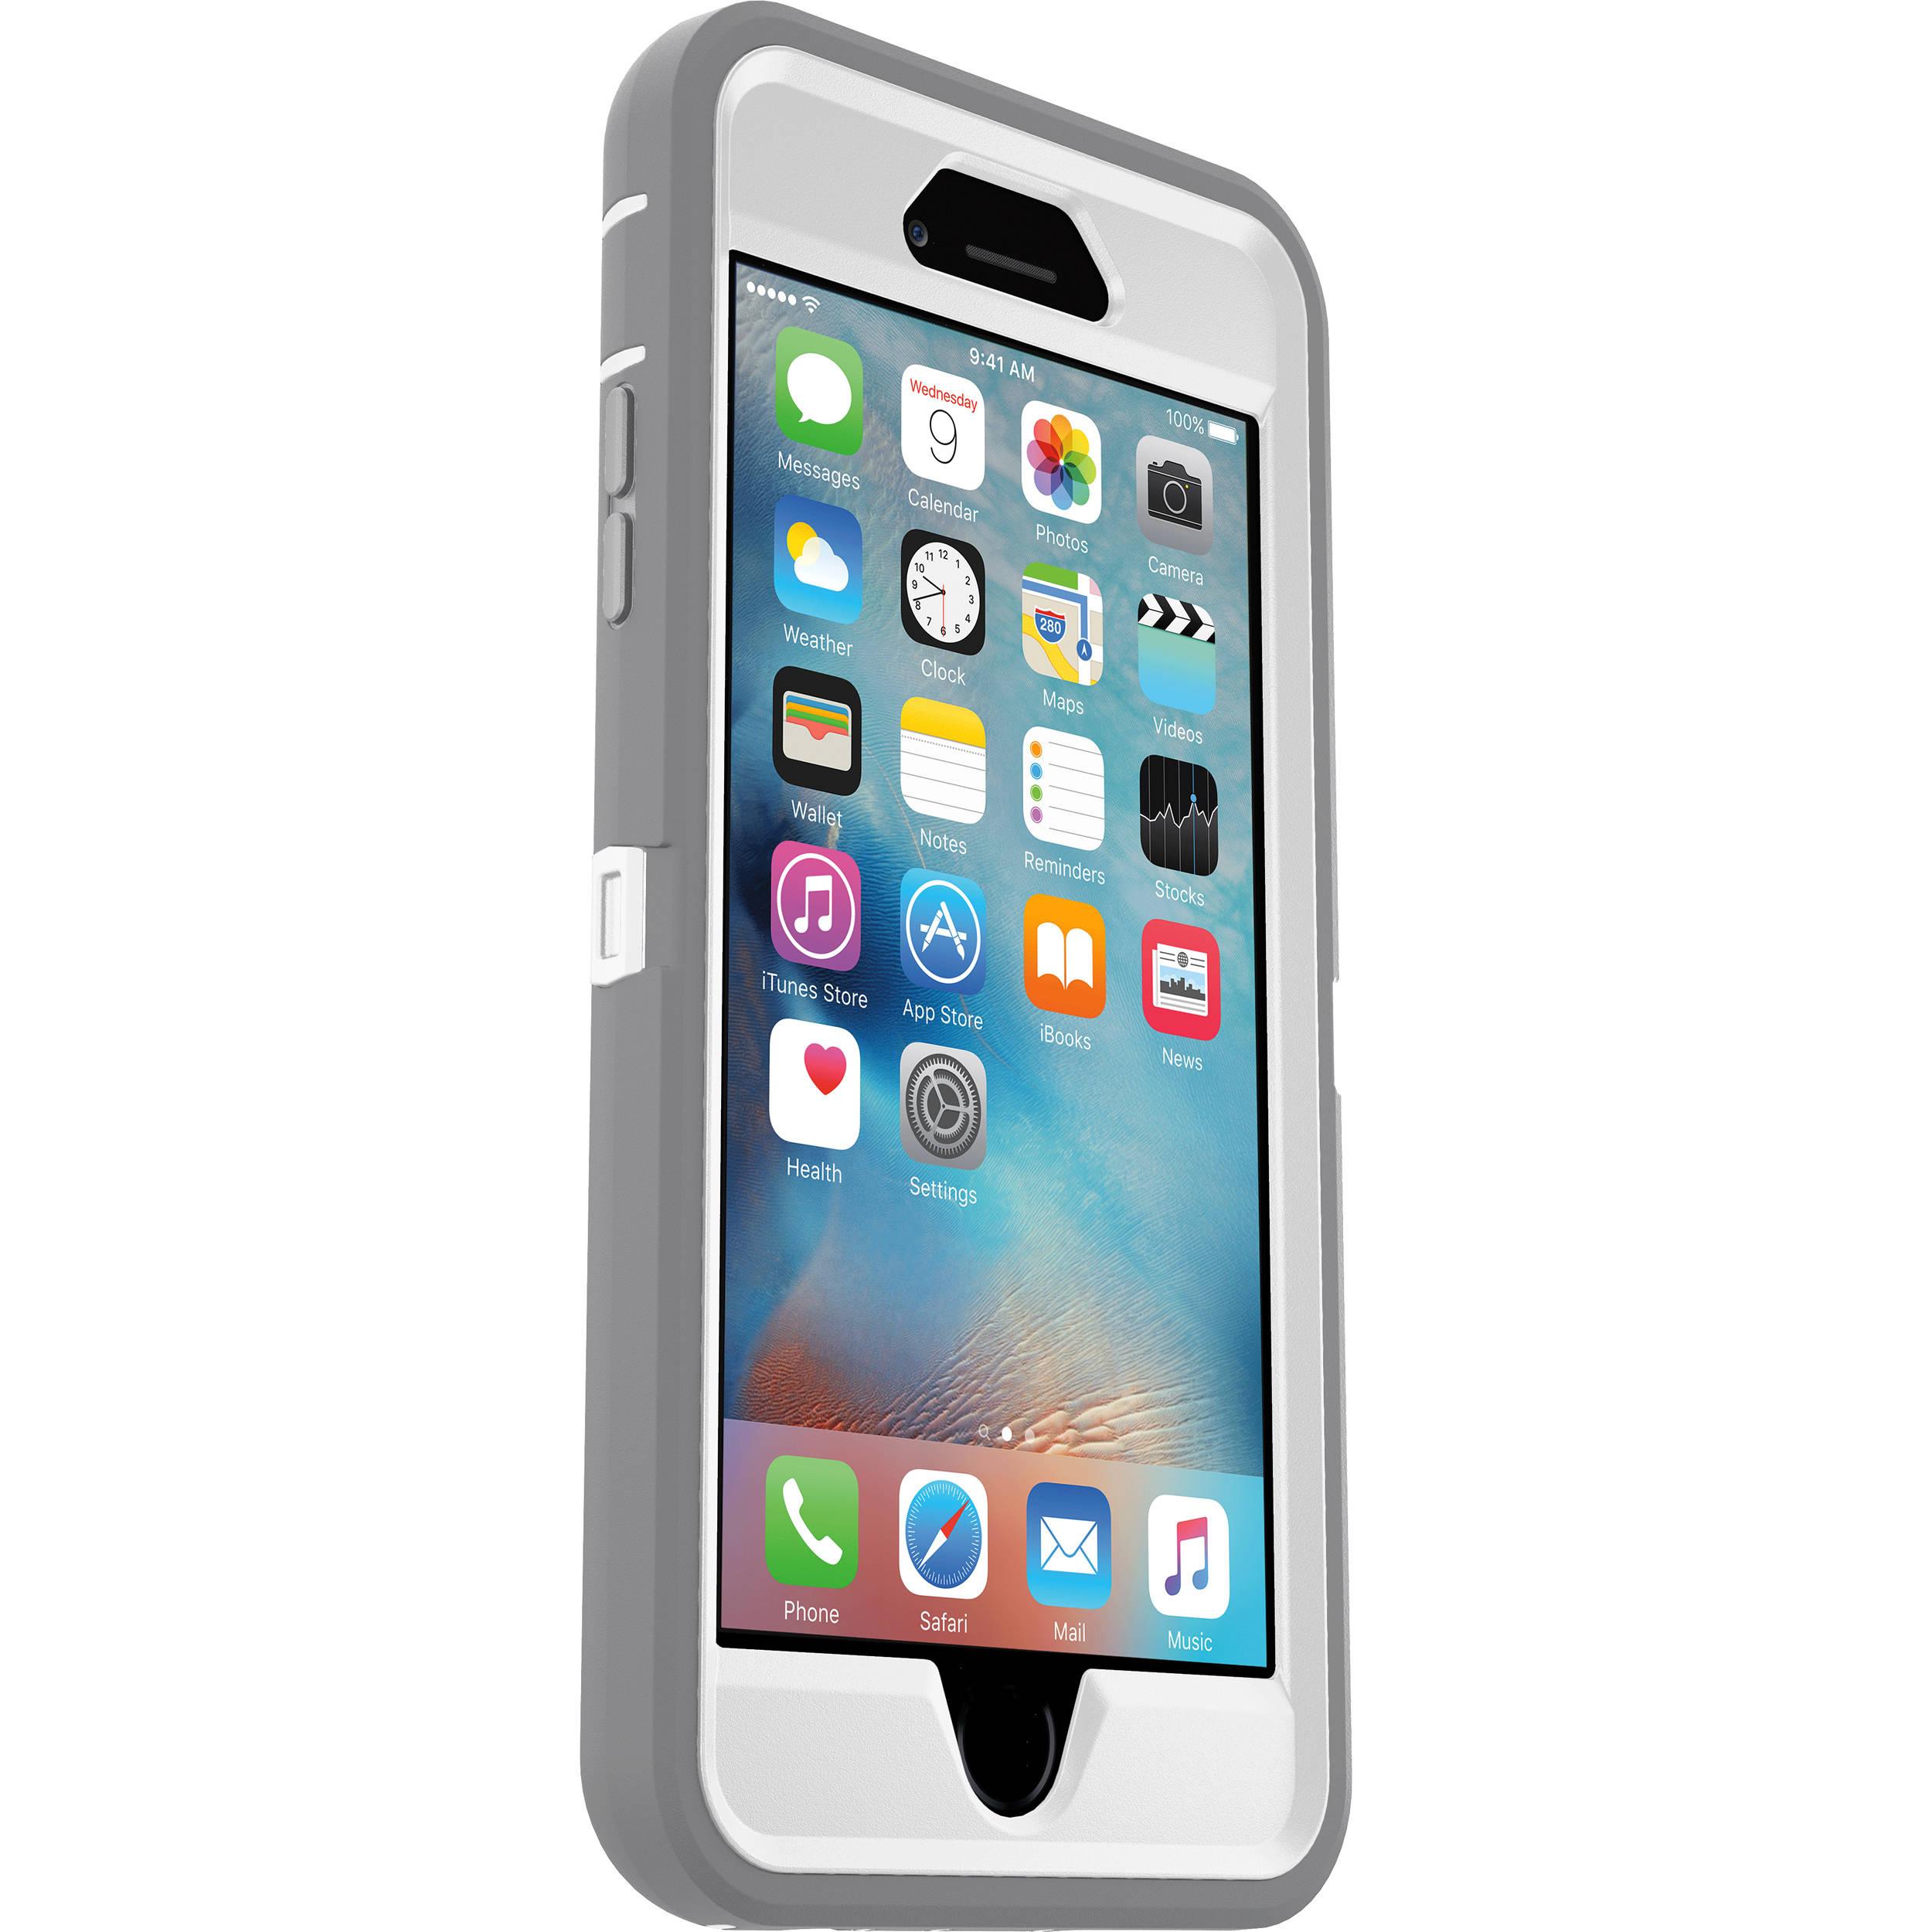 OtterBox Defender Series Case for iPhone 6 Plus/6s Plus (Glacier)